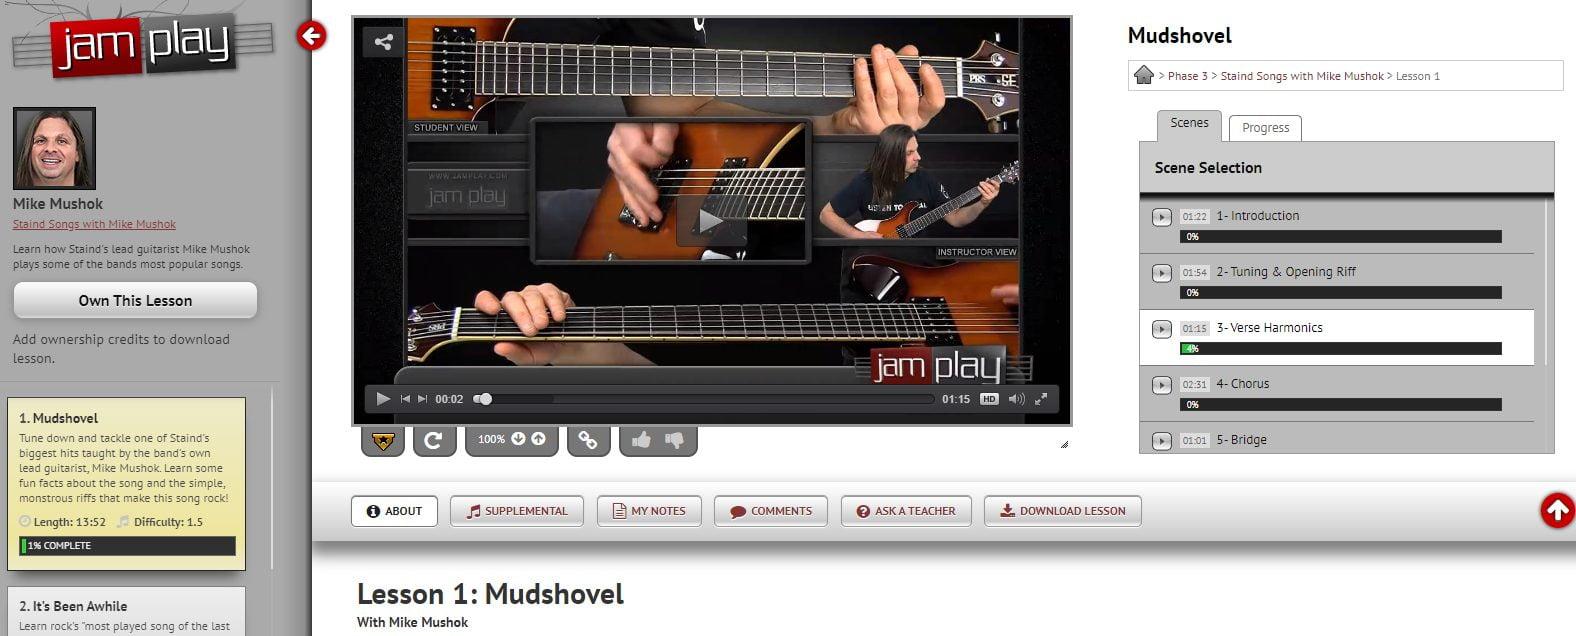 Mike Mushok Guitar Lesson in JamPlay